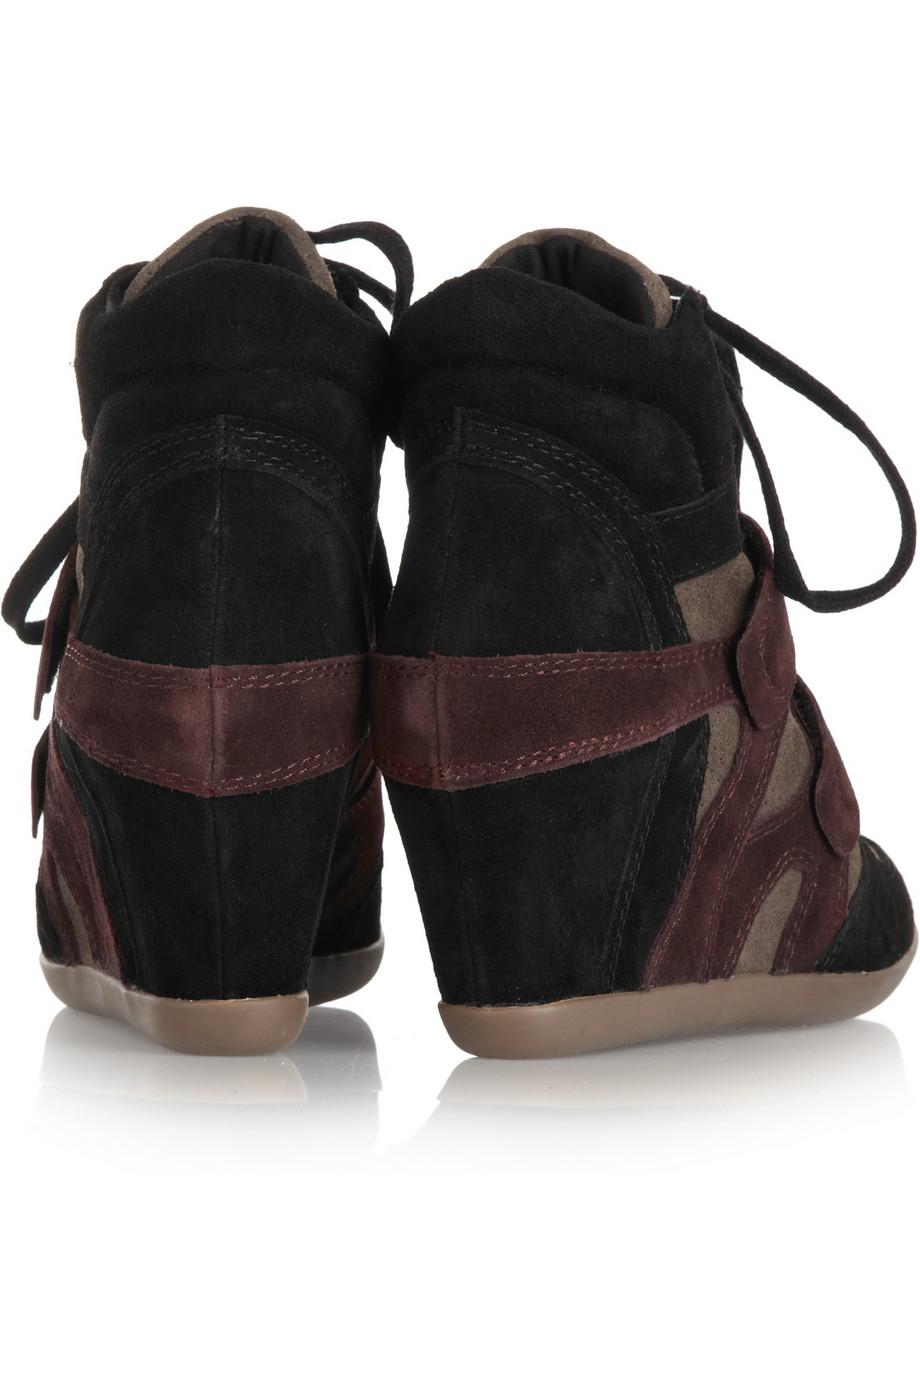 Ash Bea Suede Wedge High-Top Sneakers in Plum (Purple)